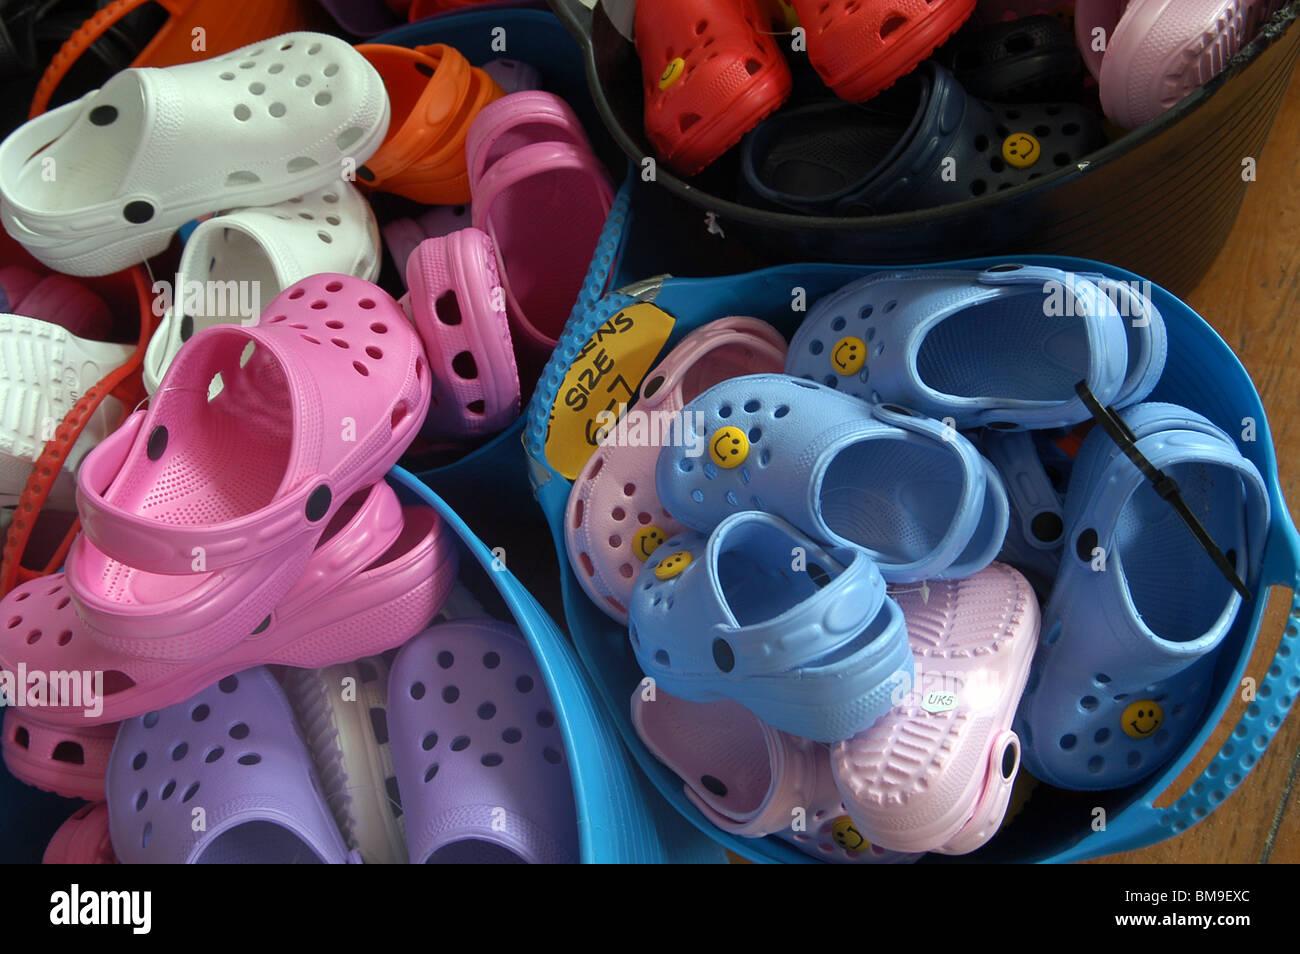 Crocs For Sale High Resolution Stock